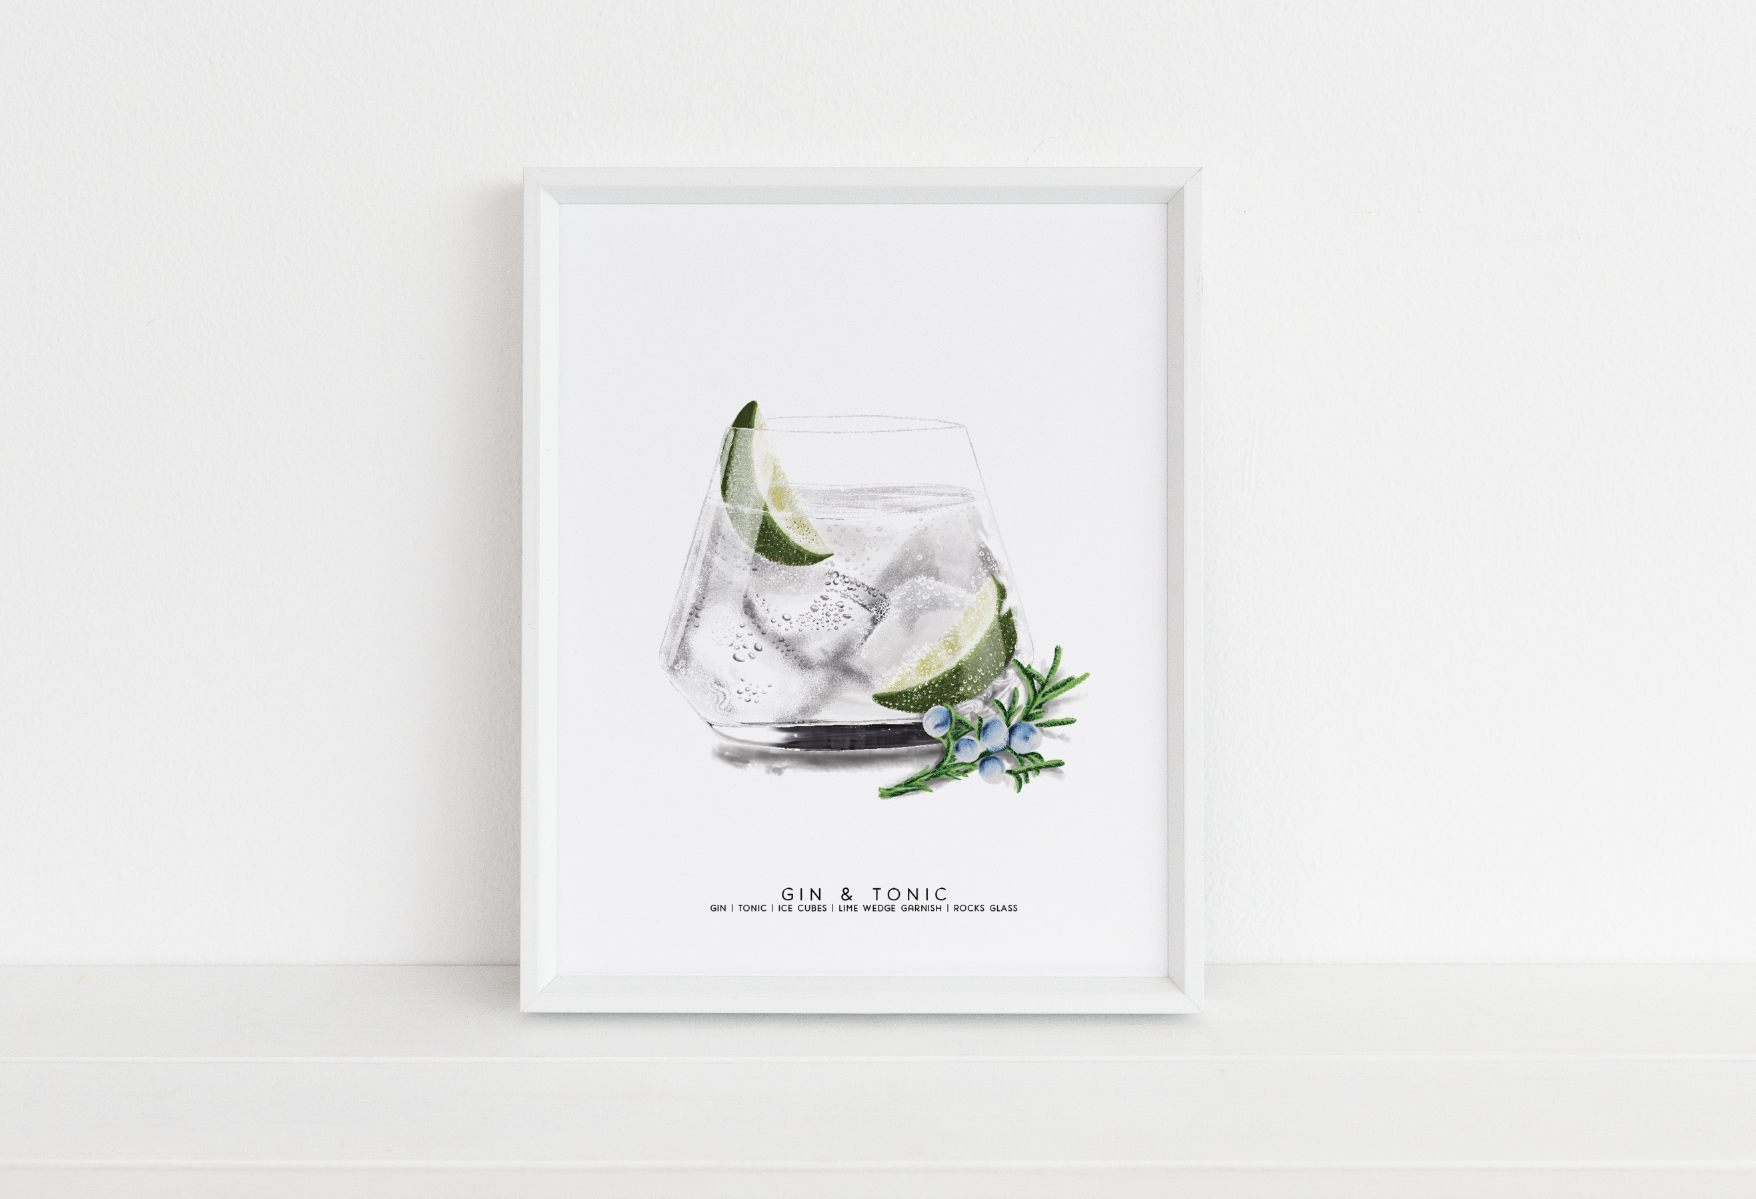 Gin & Tonic Digital Illustration by Michigan artist, Cheryl Oz